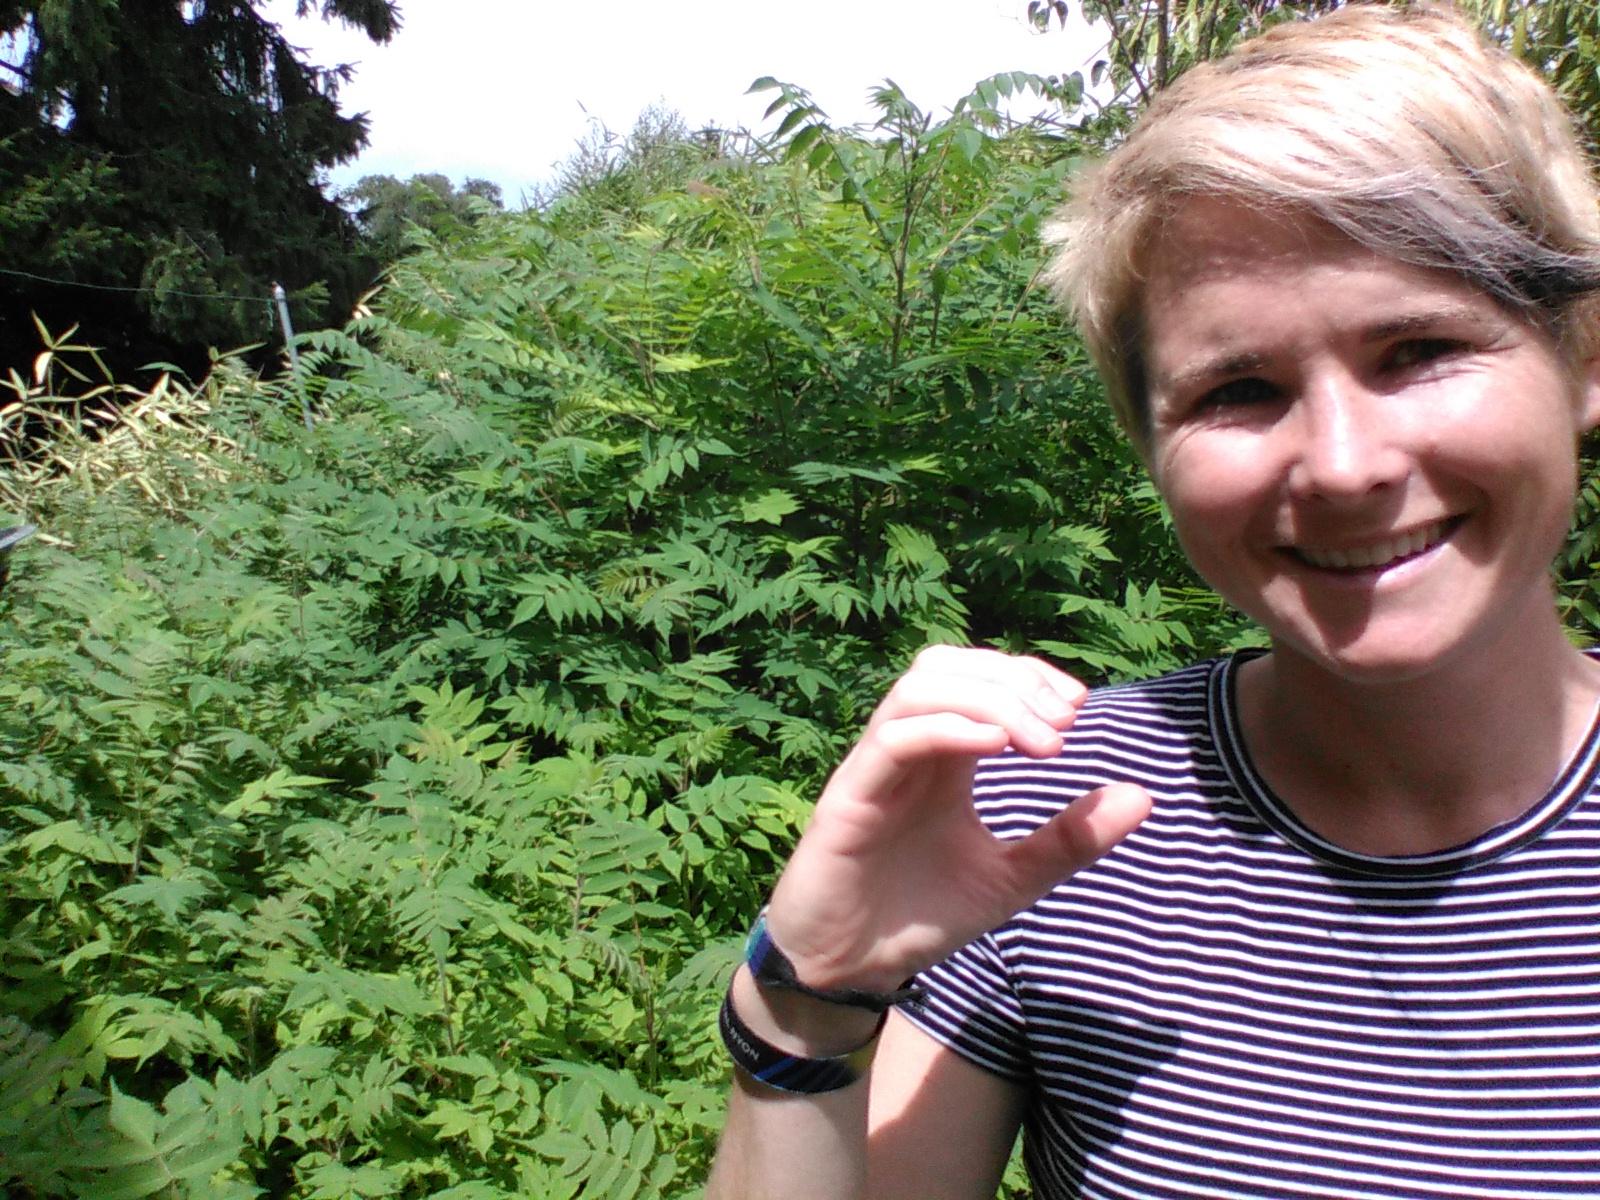 Eat Less Meat to Save the Planet- Nurse Emily Rushton